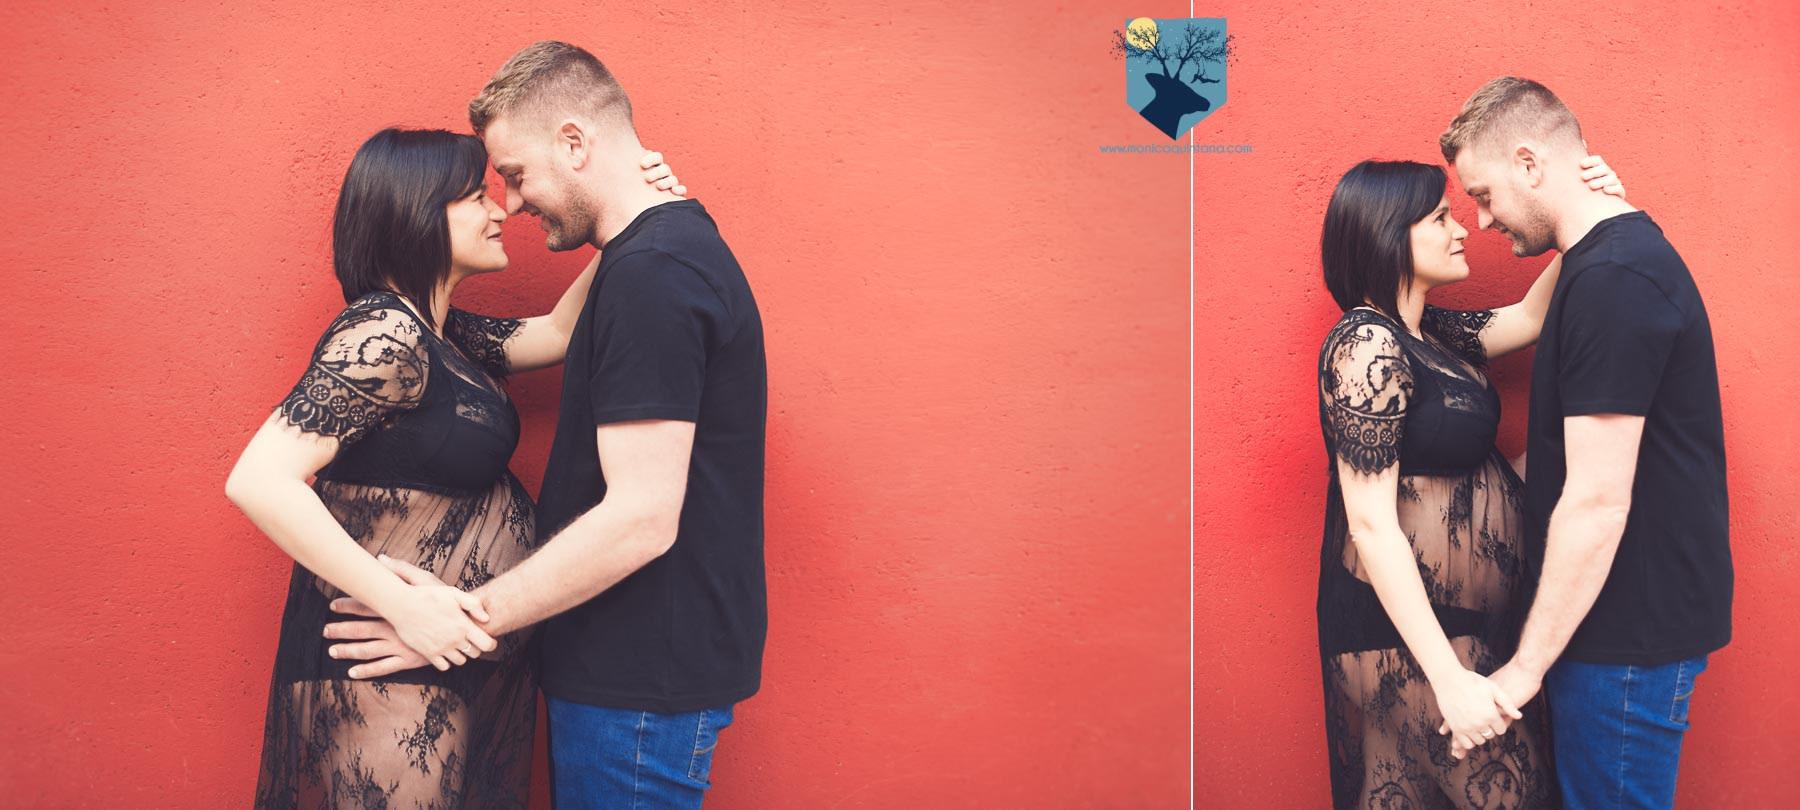 fotografia-girona-figueres emporda monica quintana familia retrato embarazo embarazada pareja amor estudio